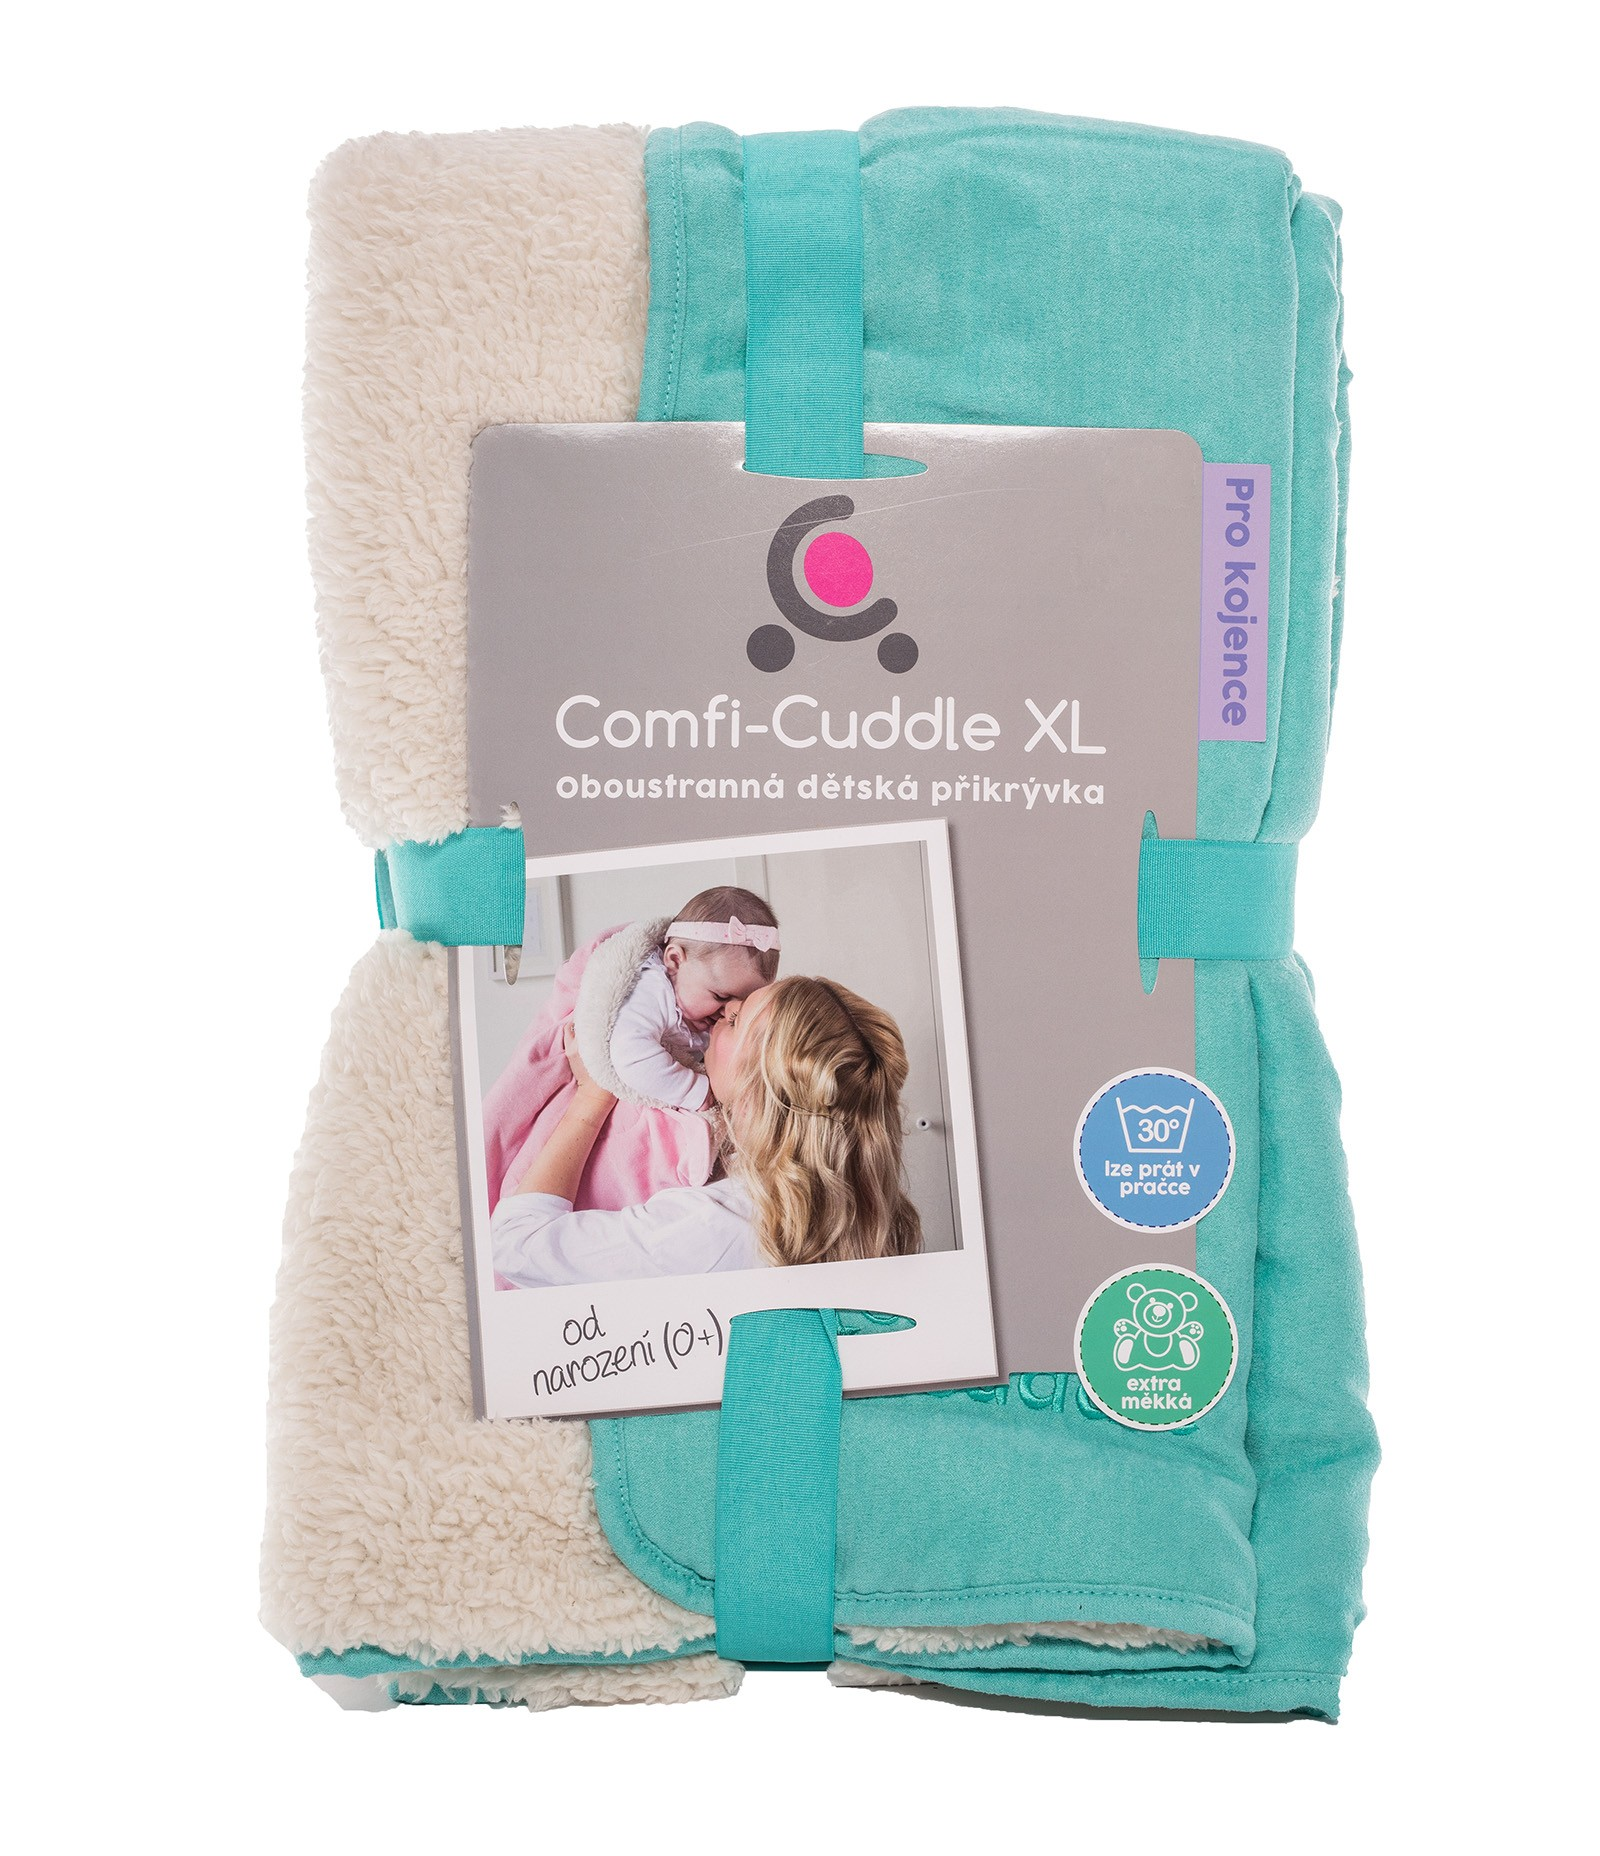 Cuddleco Dětská deka Comfi-Cuddle 140x100cm - Tiffany Blue